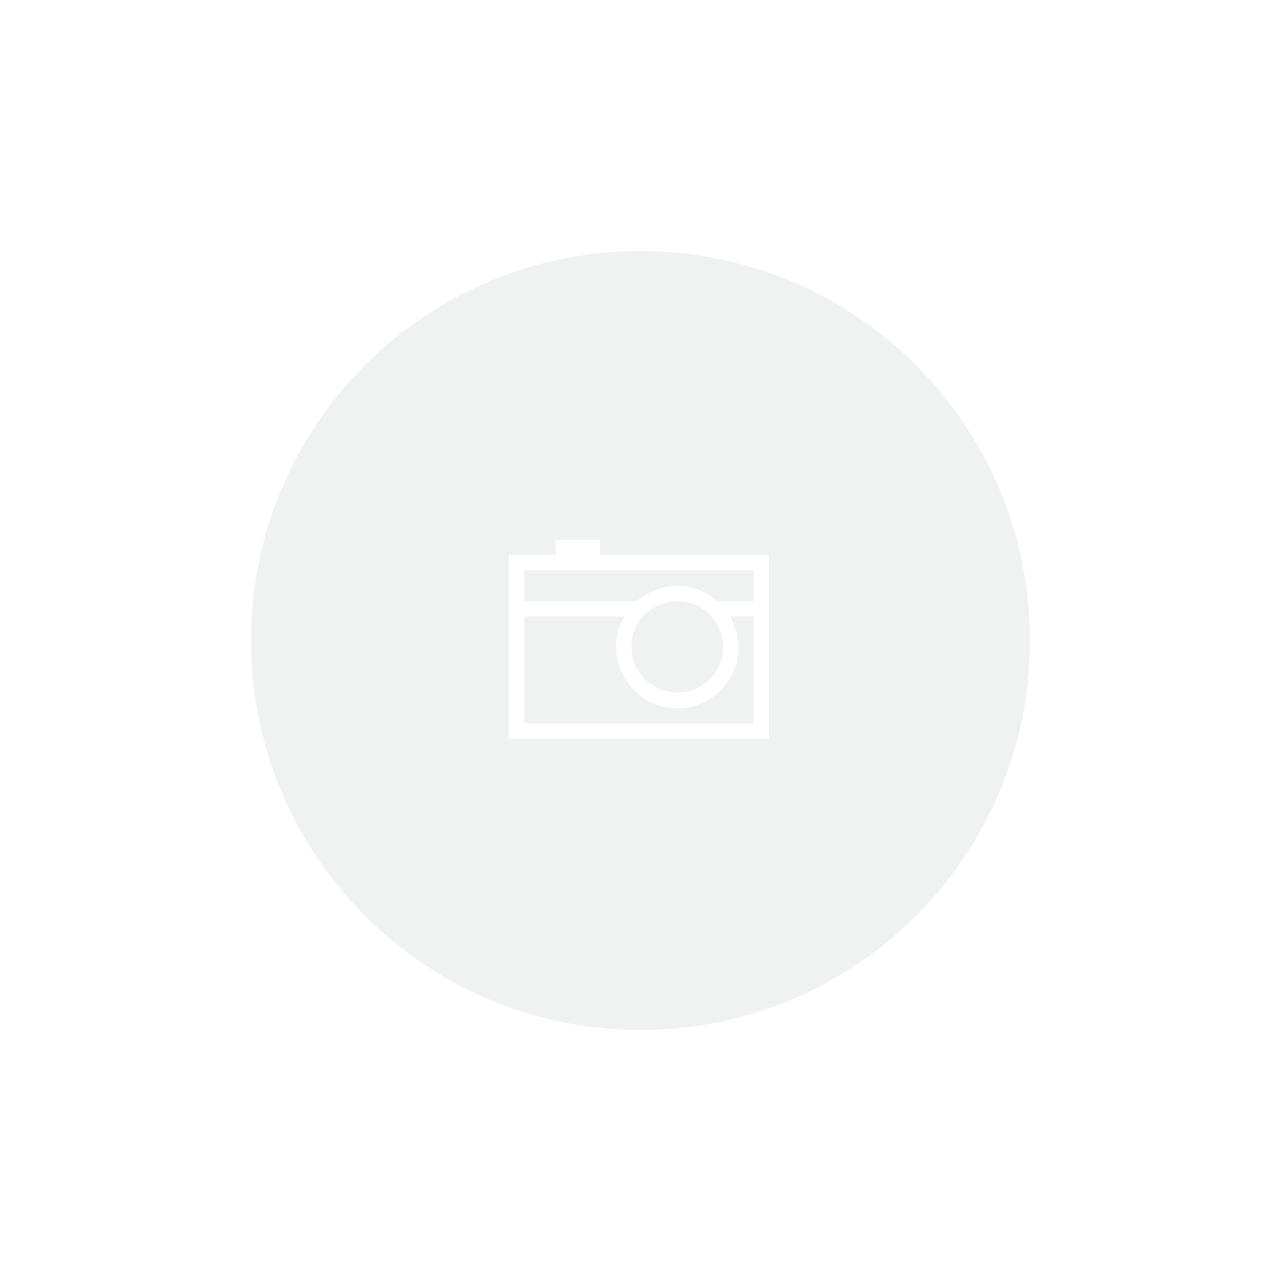 Cozi-Pasta Inox 24Cm 8,00 Litros Solar Tramontina